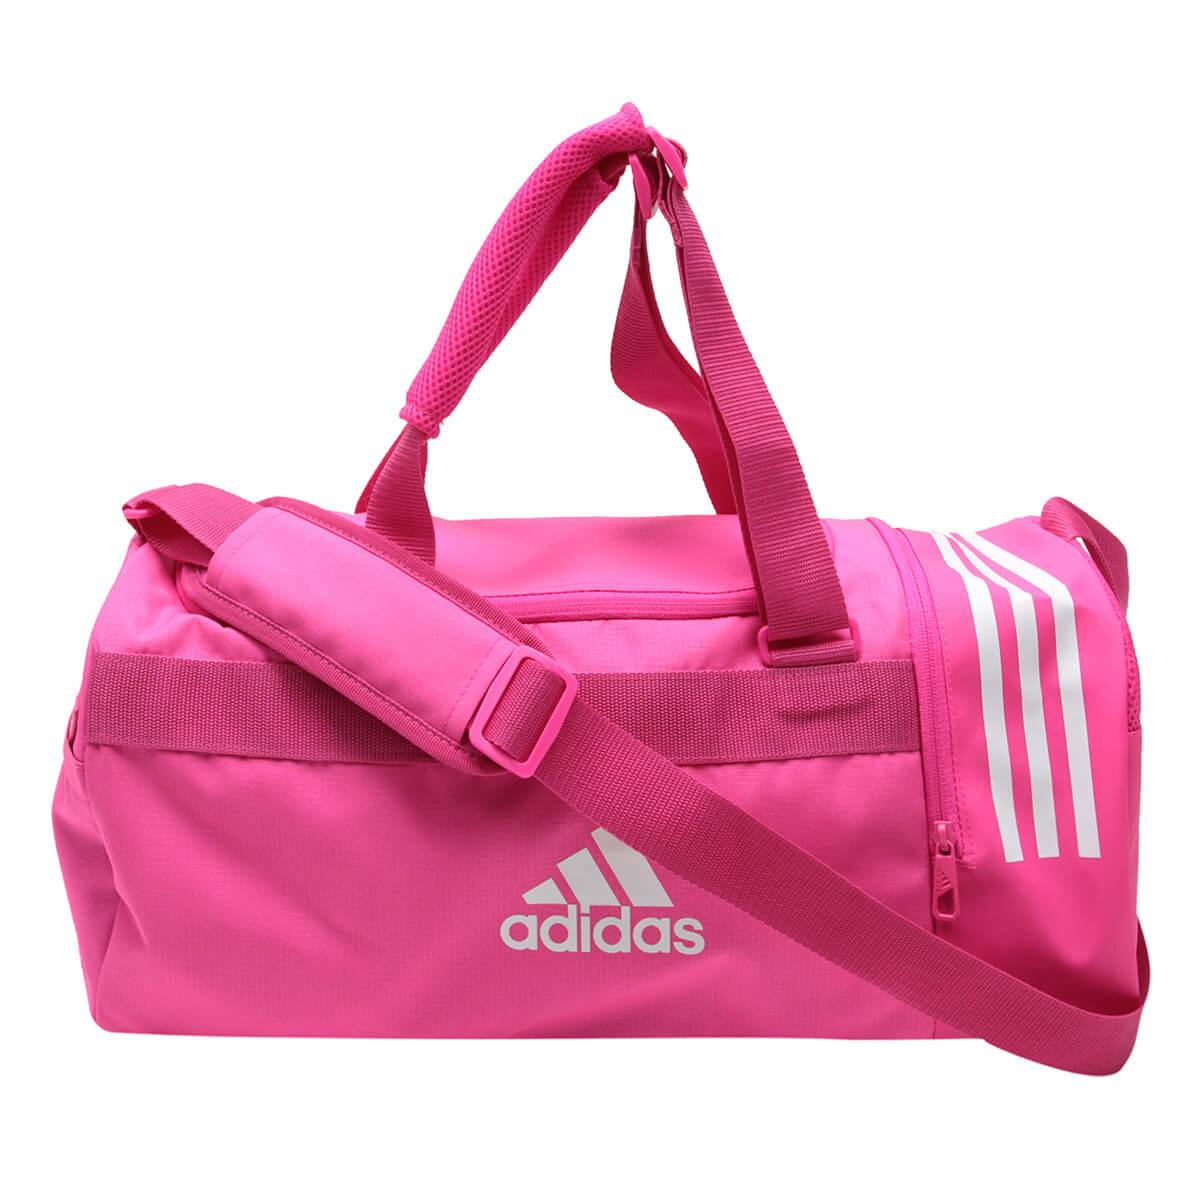 Mala Adidas 3 Stripes Duffel - Feminina